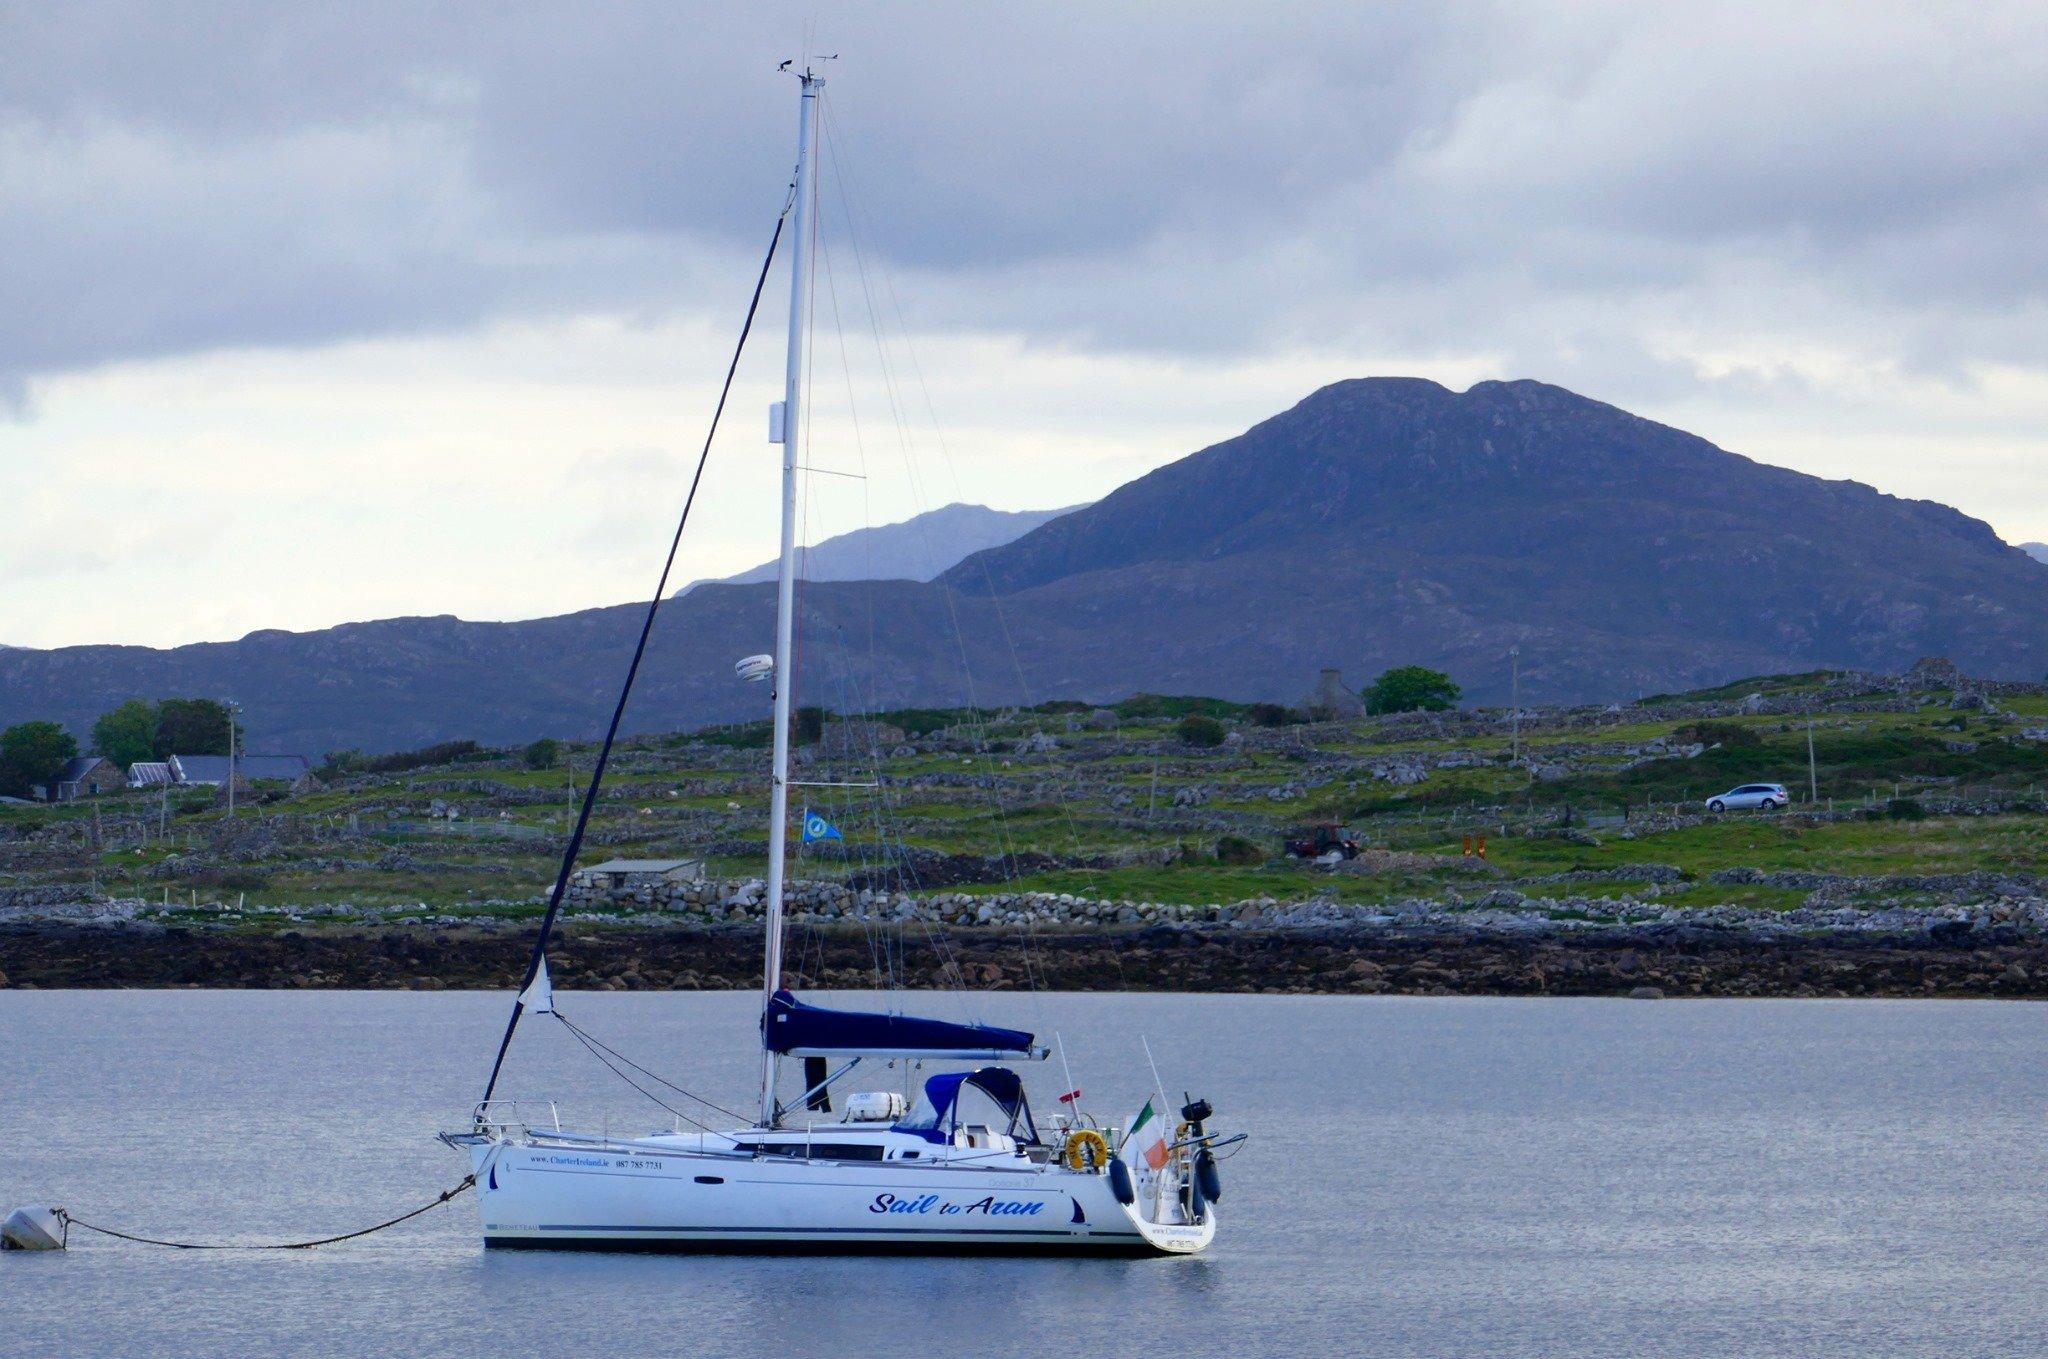 Charter Ireland - Visit Galway